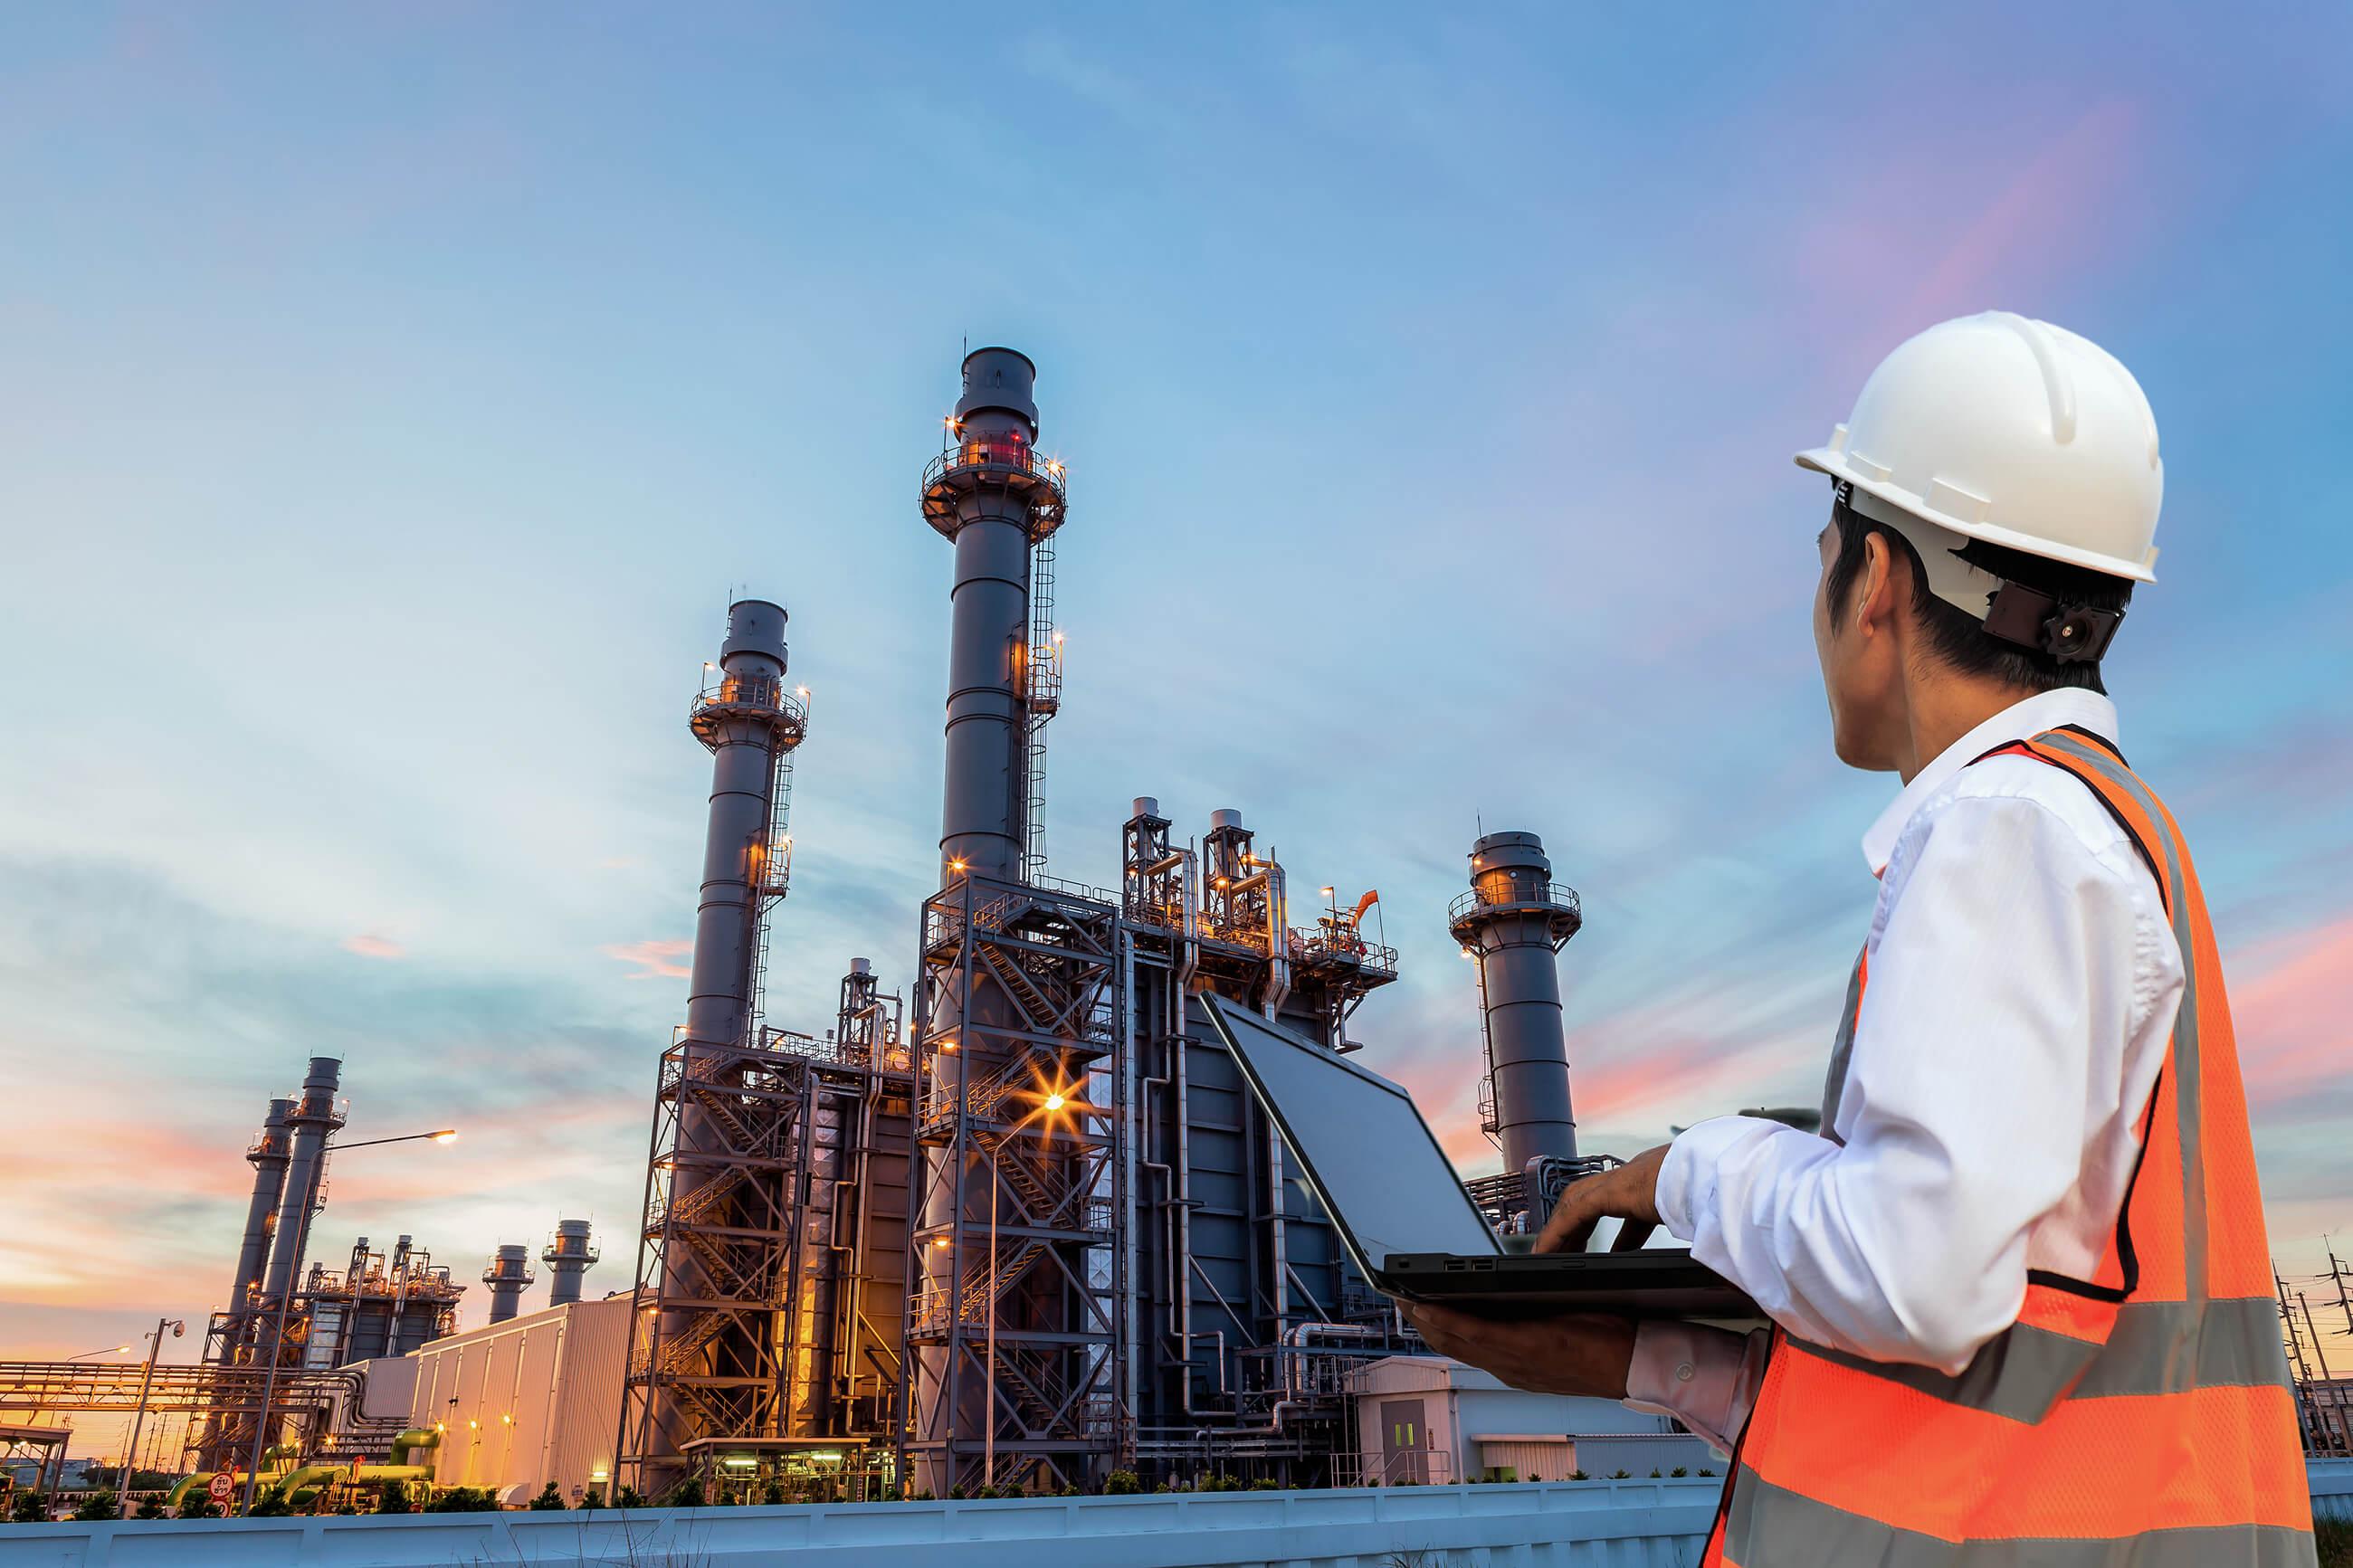 refinery oil field recruitment services